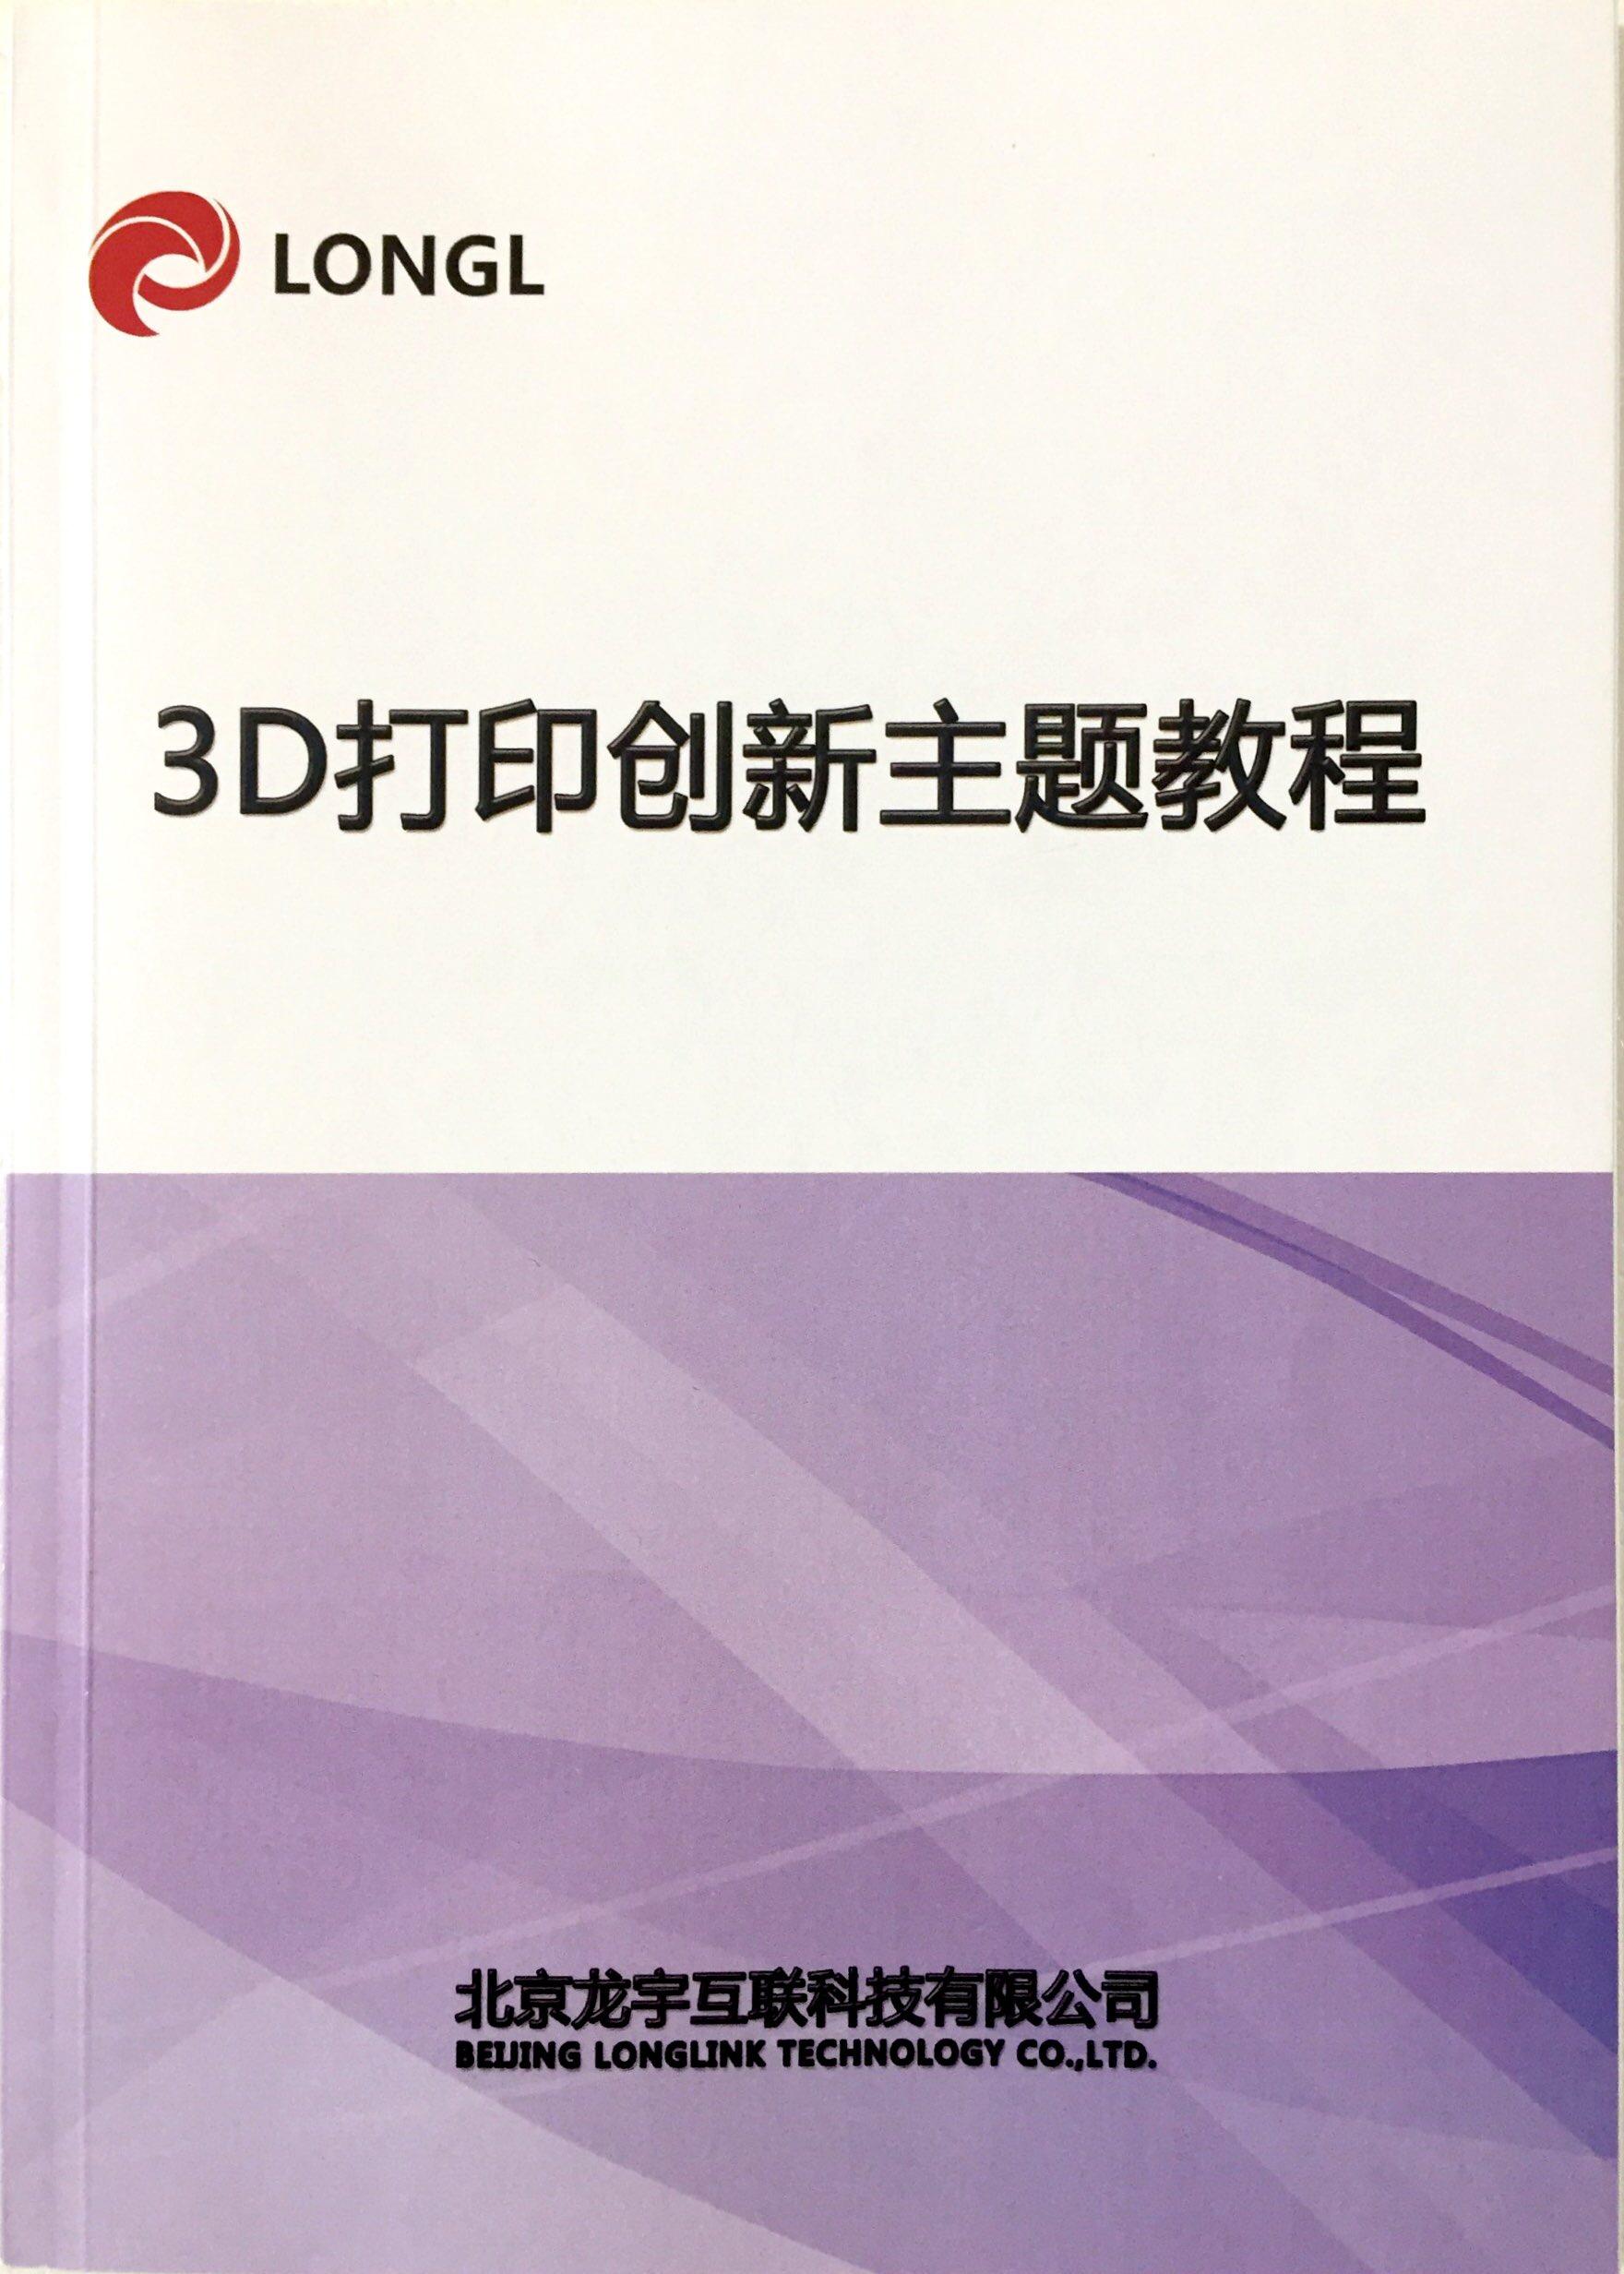 3D打印创业创新实践课程